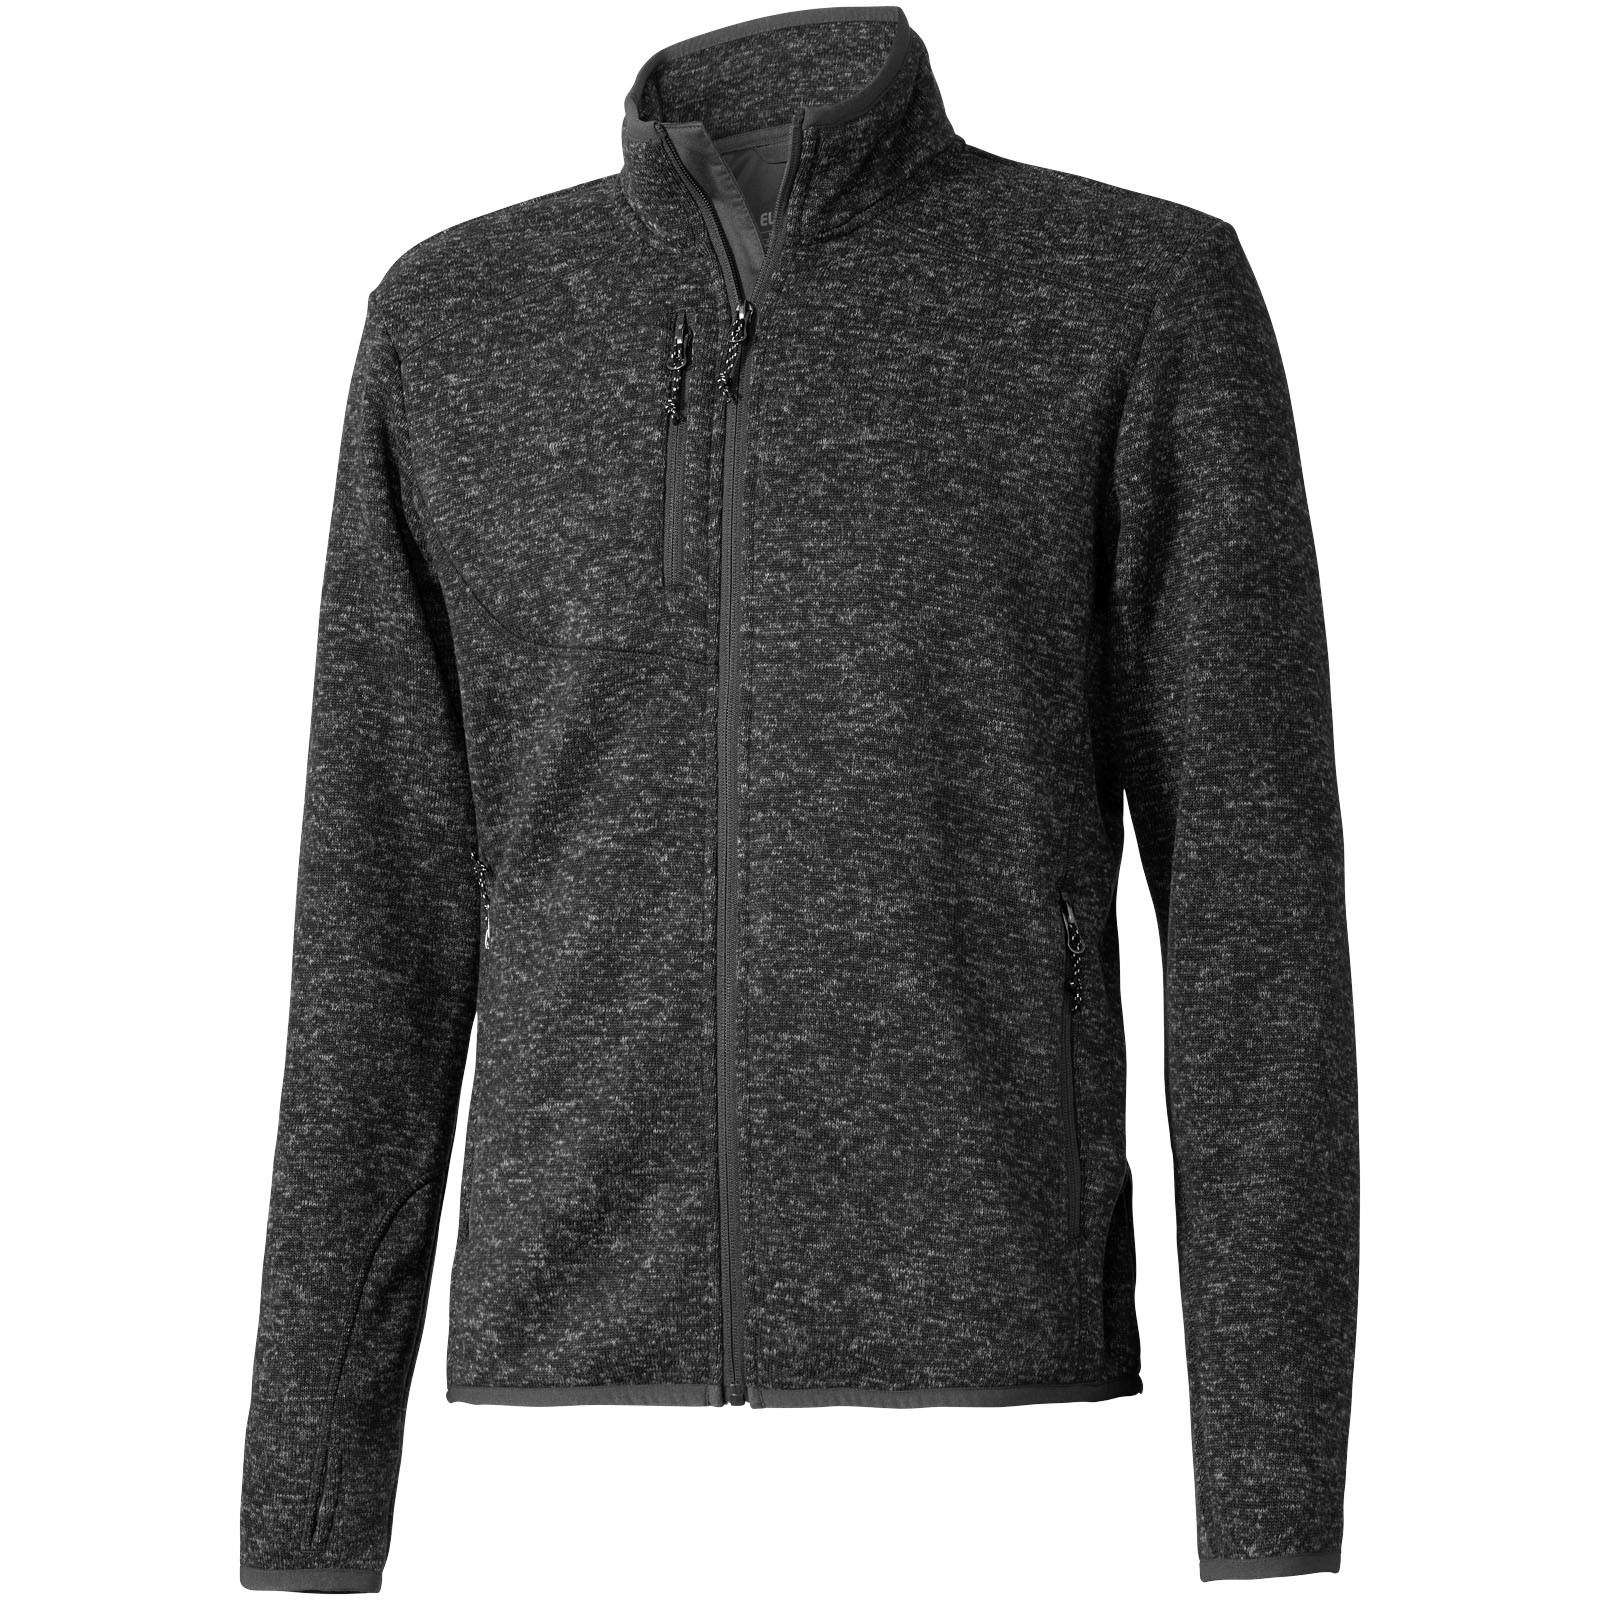 Tremblant knit jacket - Heather Smoke / M